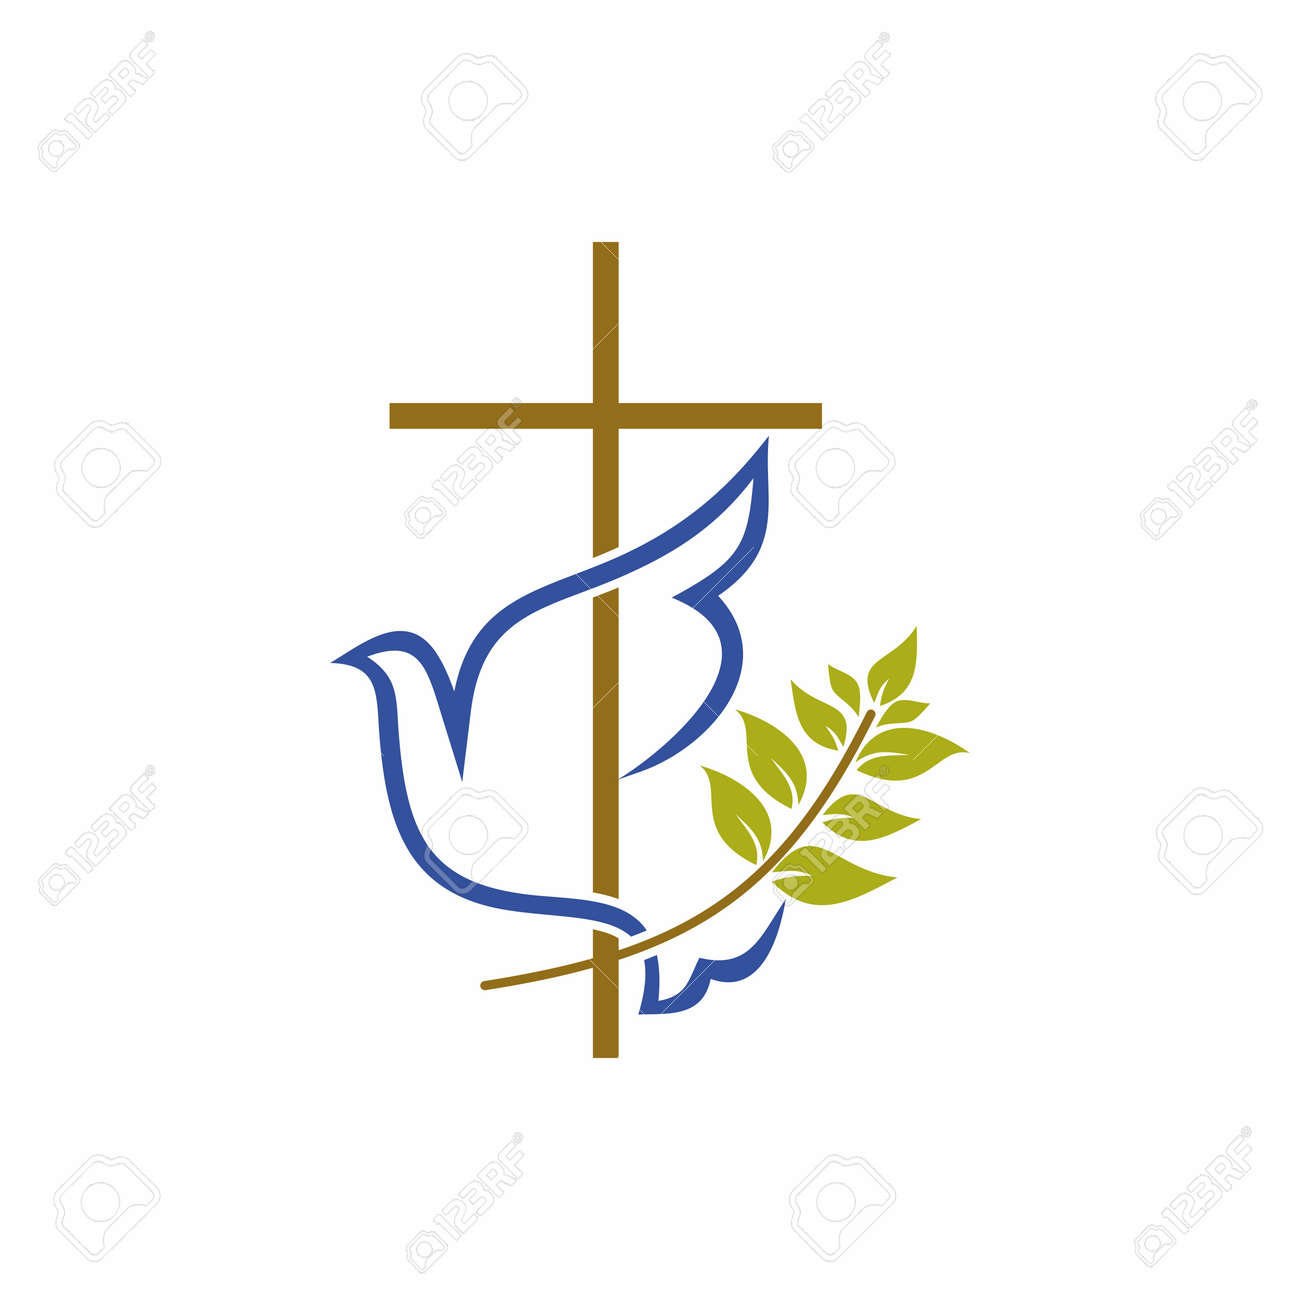 Church logo. Christian symbols. Cross, dove and olive branch. - 55094139